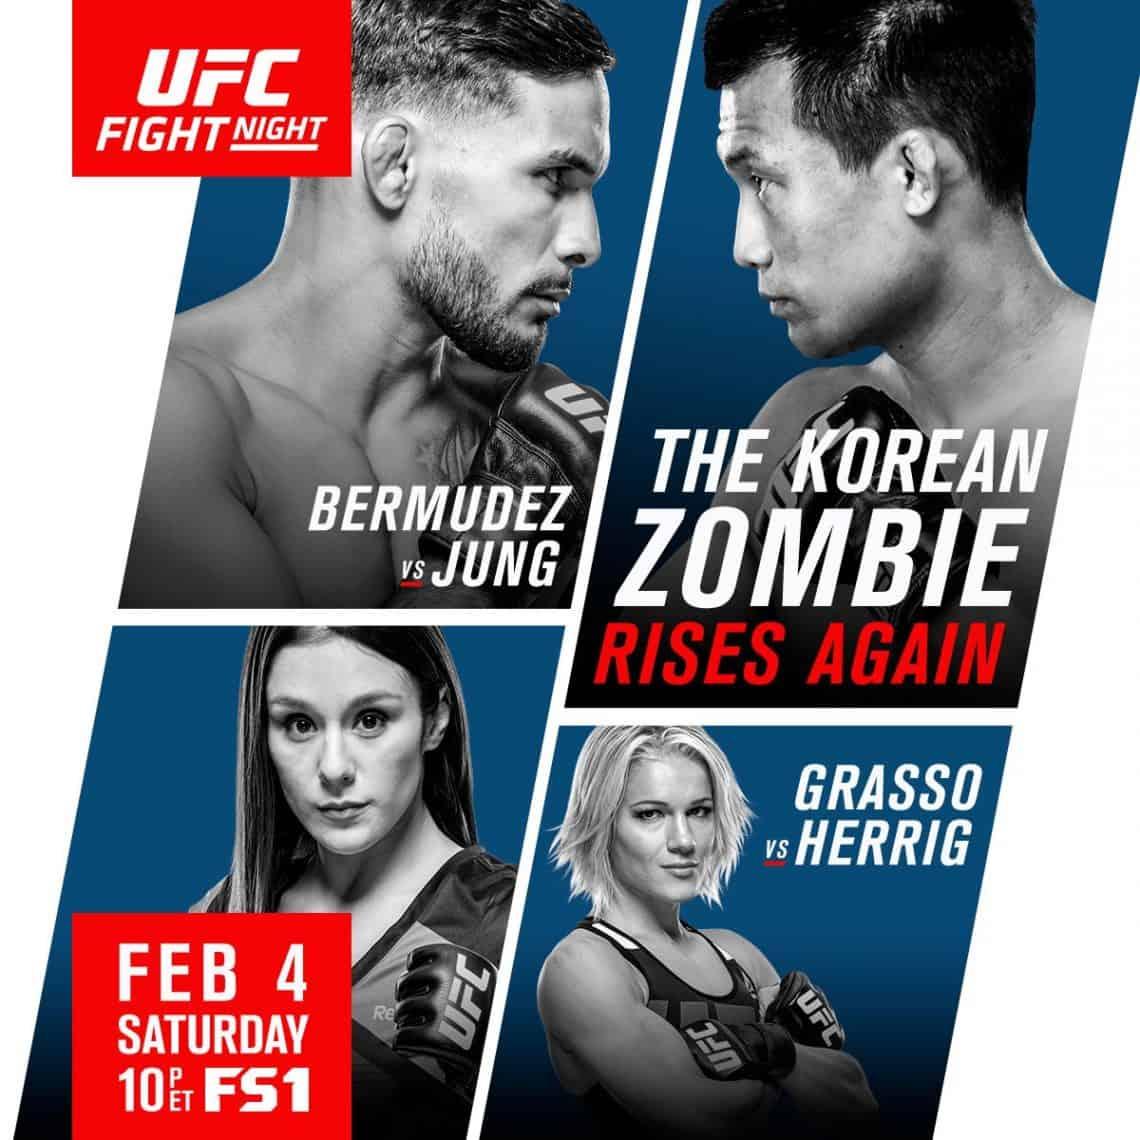 UFC Fight Night: Bermudez vs. Korean Zombie 1